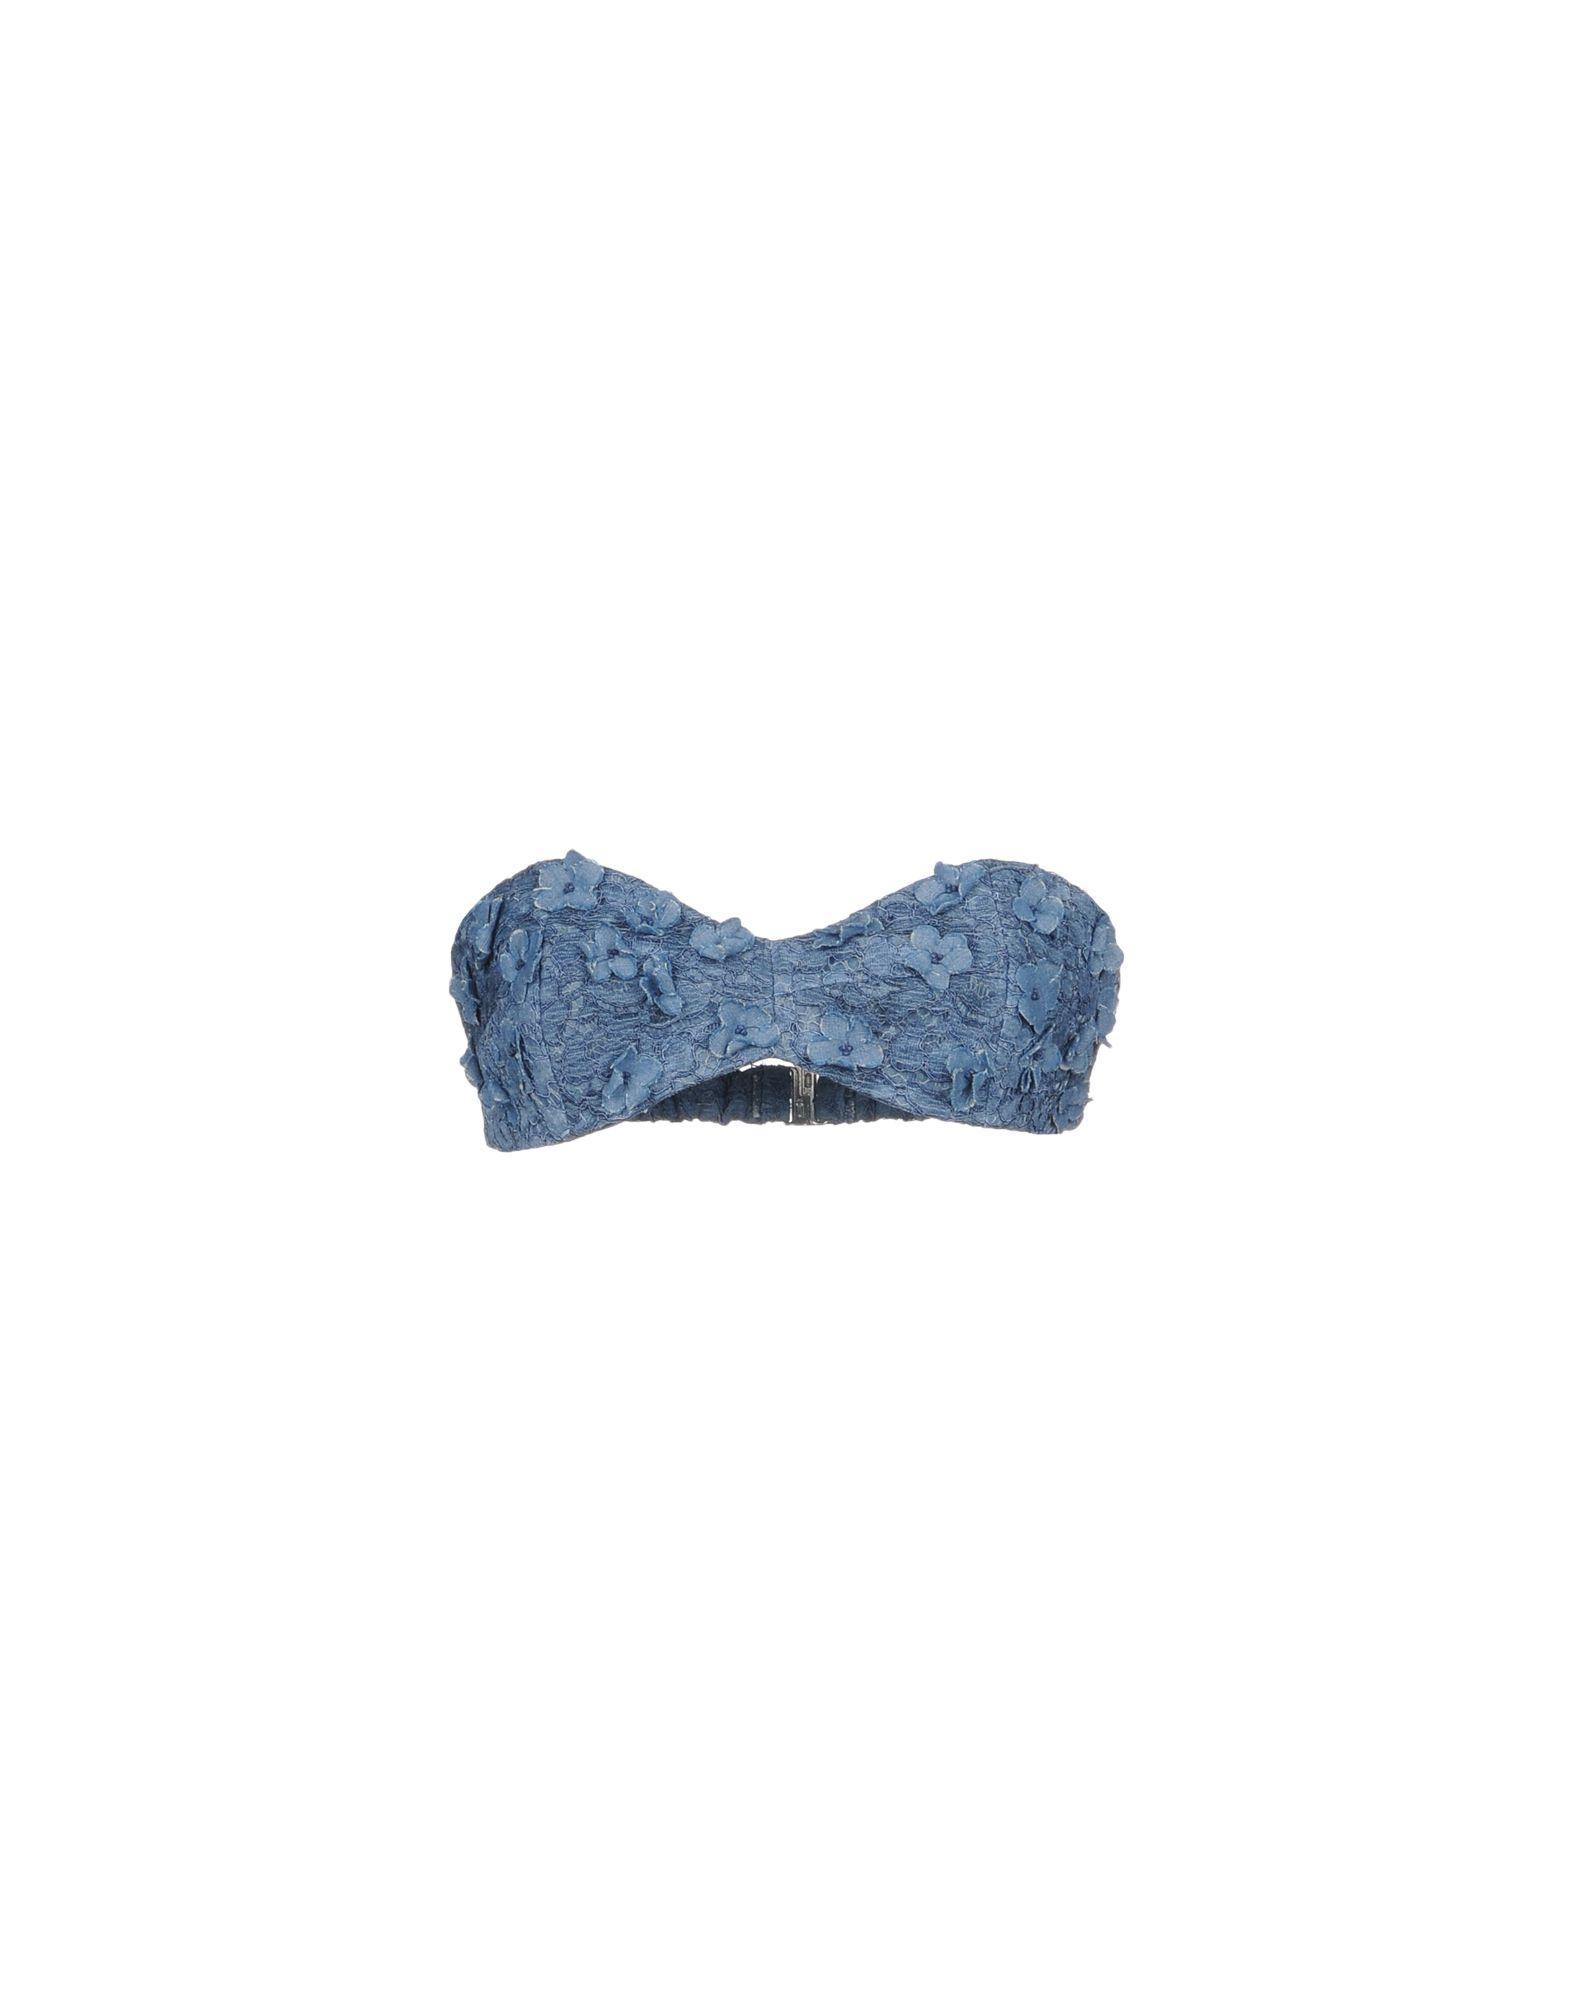 Michael Kors Tube Top In Slate Blue